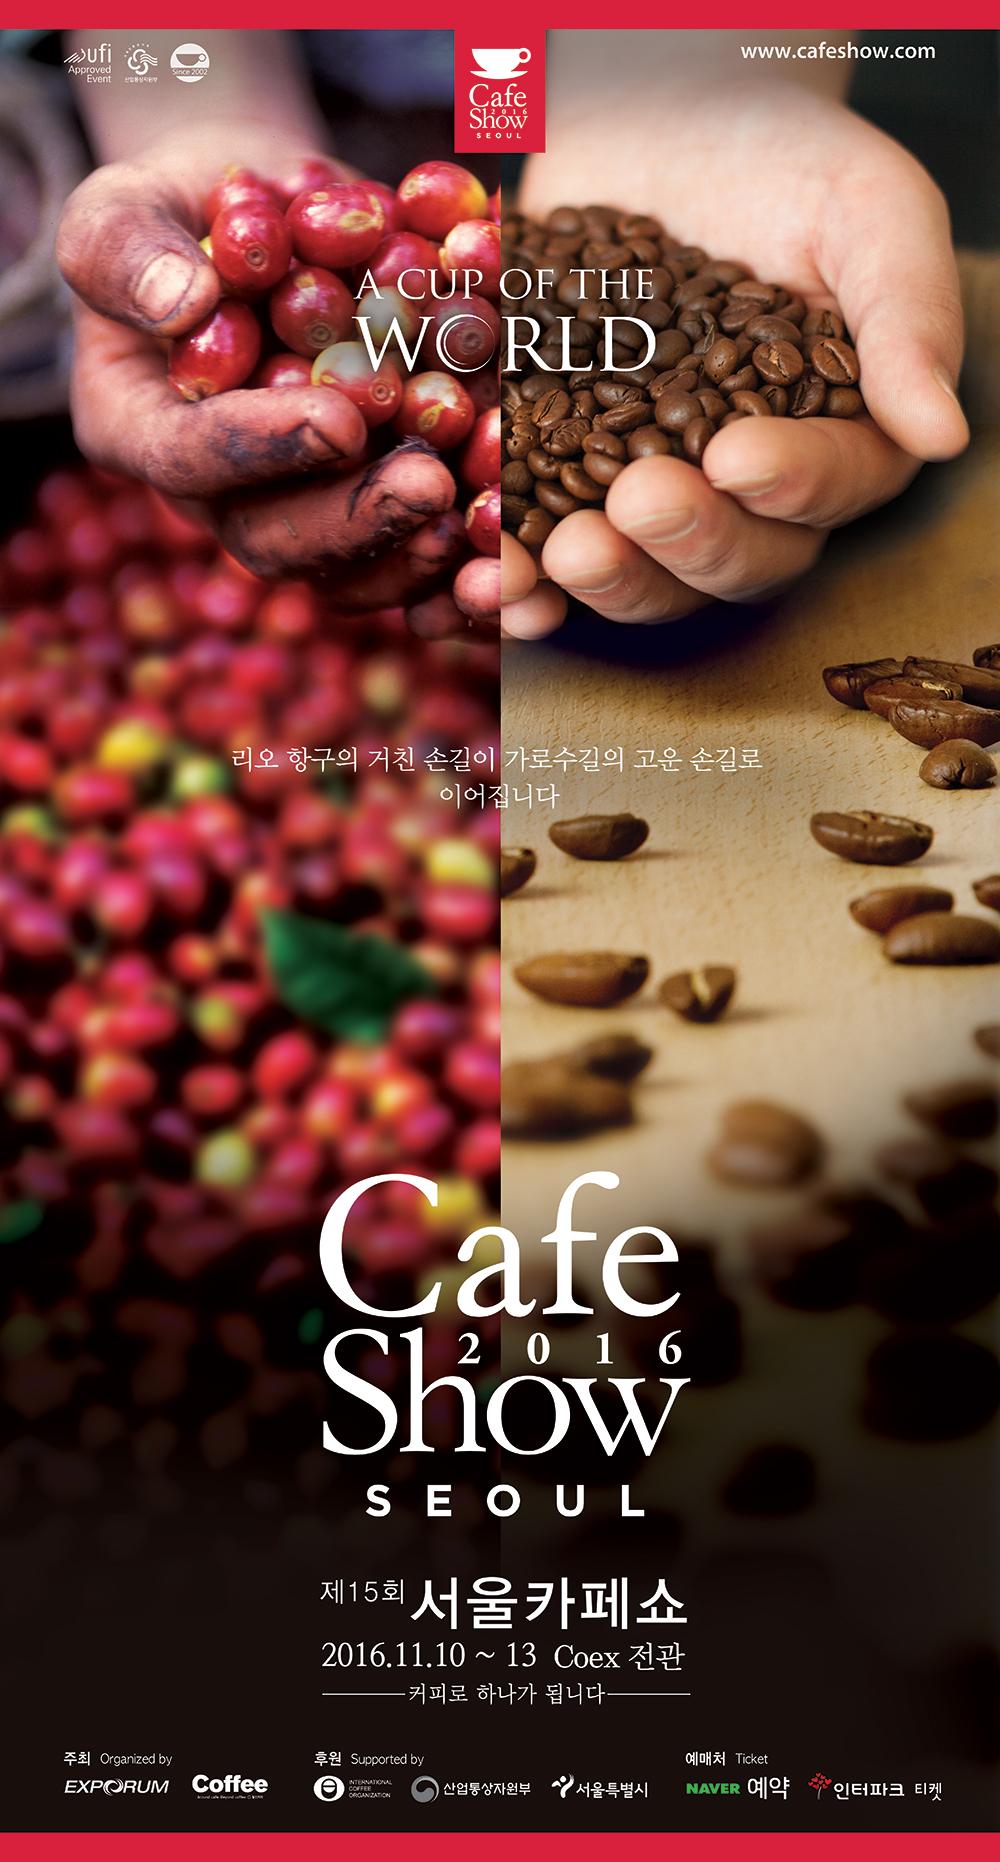 [Cafe Show Seoul 2016] 공식포스터 (1).jpg